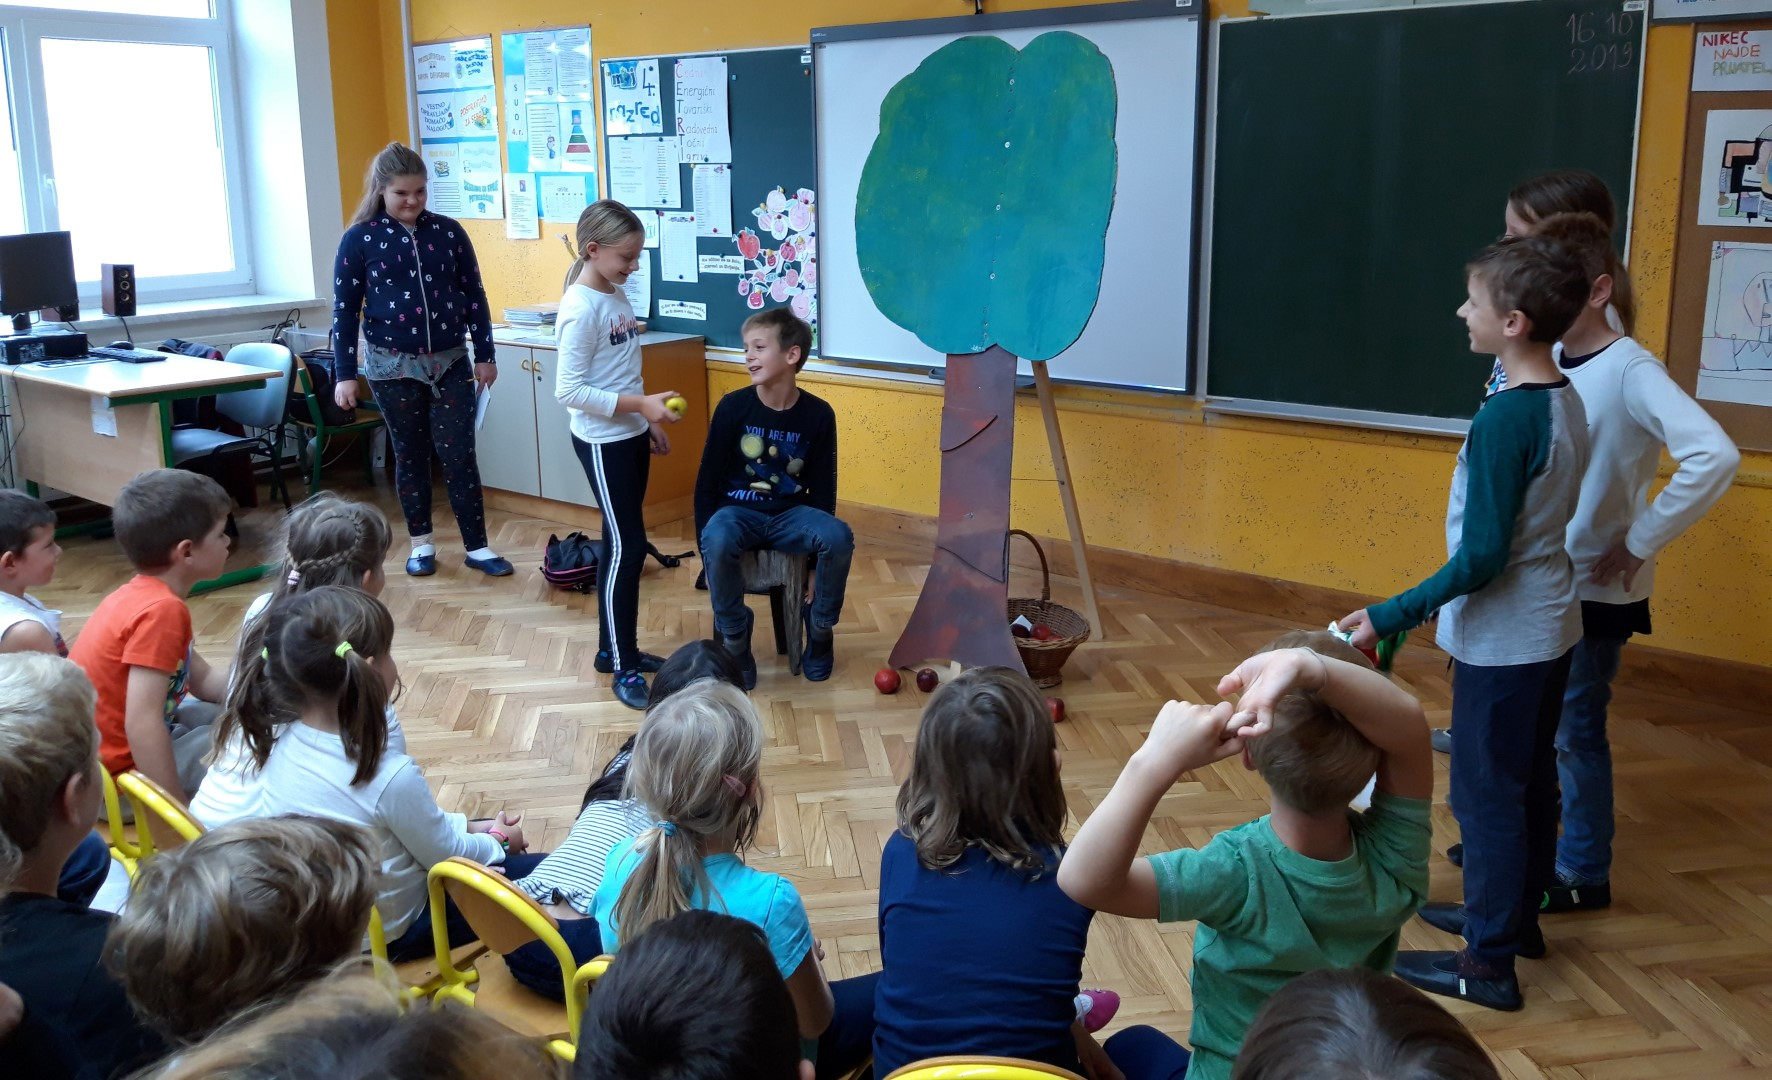 kozjanske-jabke-igra-oc5a1-lesic48dno-pkj-2019-13-10-2019-bp-63_b